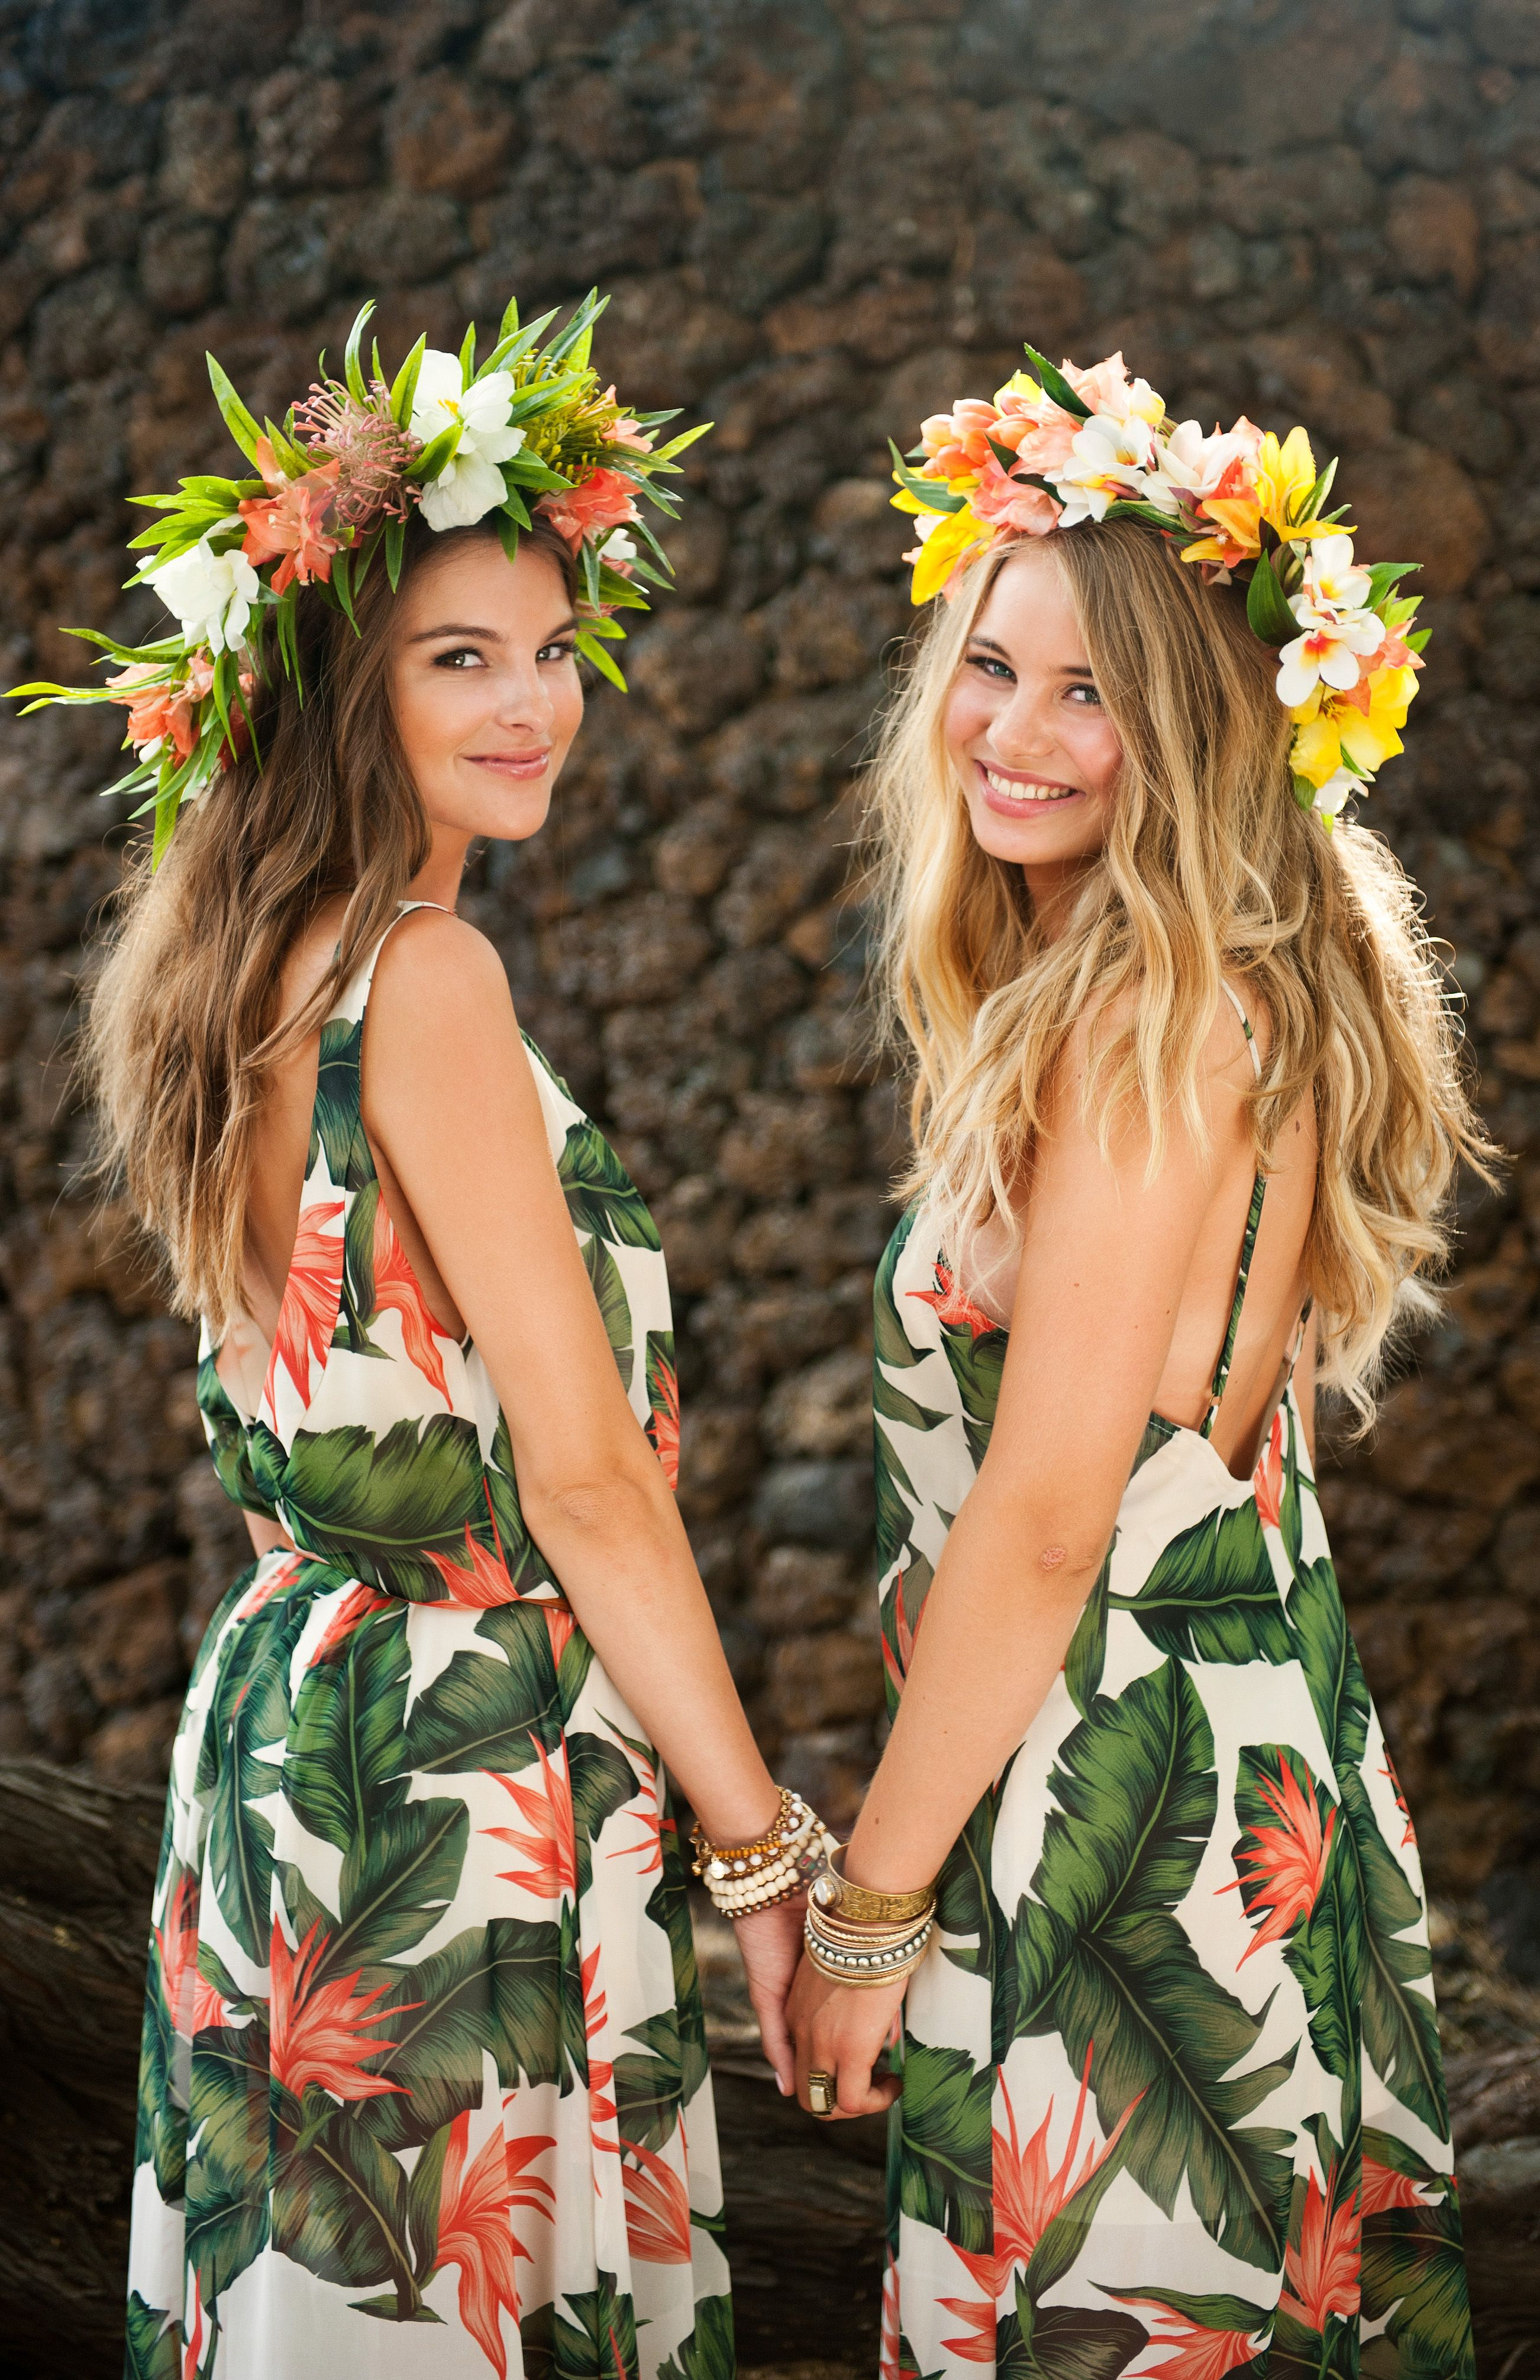 Opinion chubby hawaiian girl sorry, that